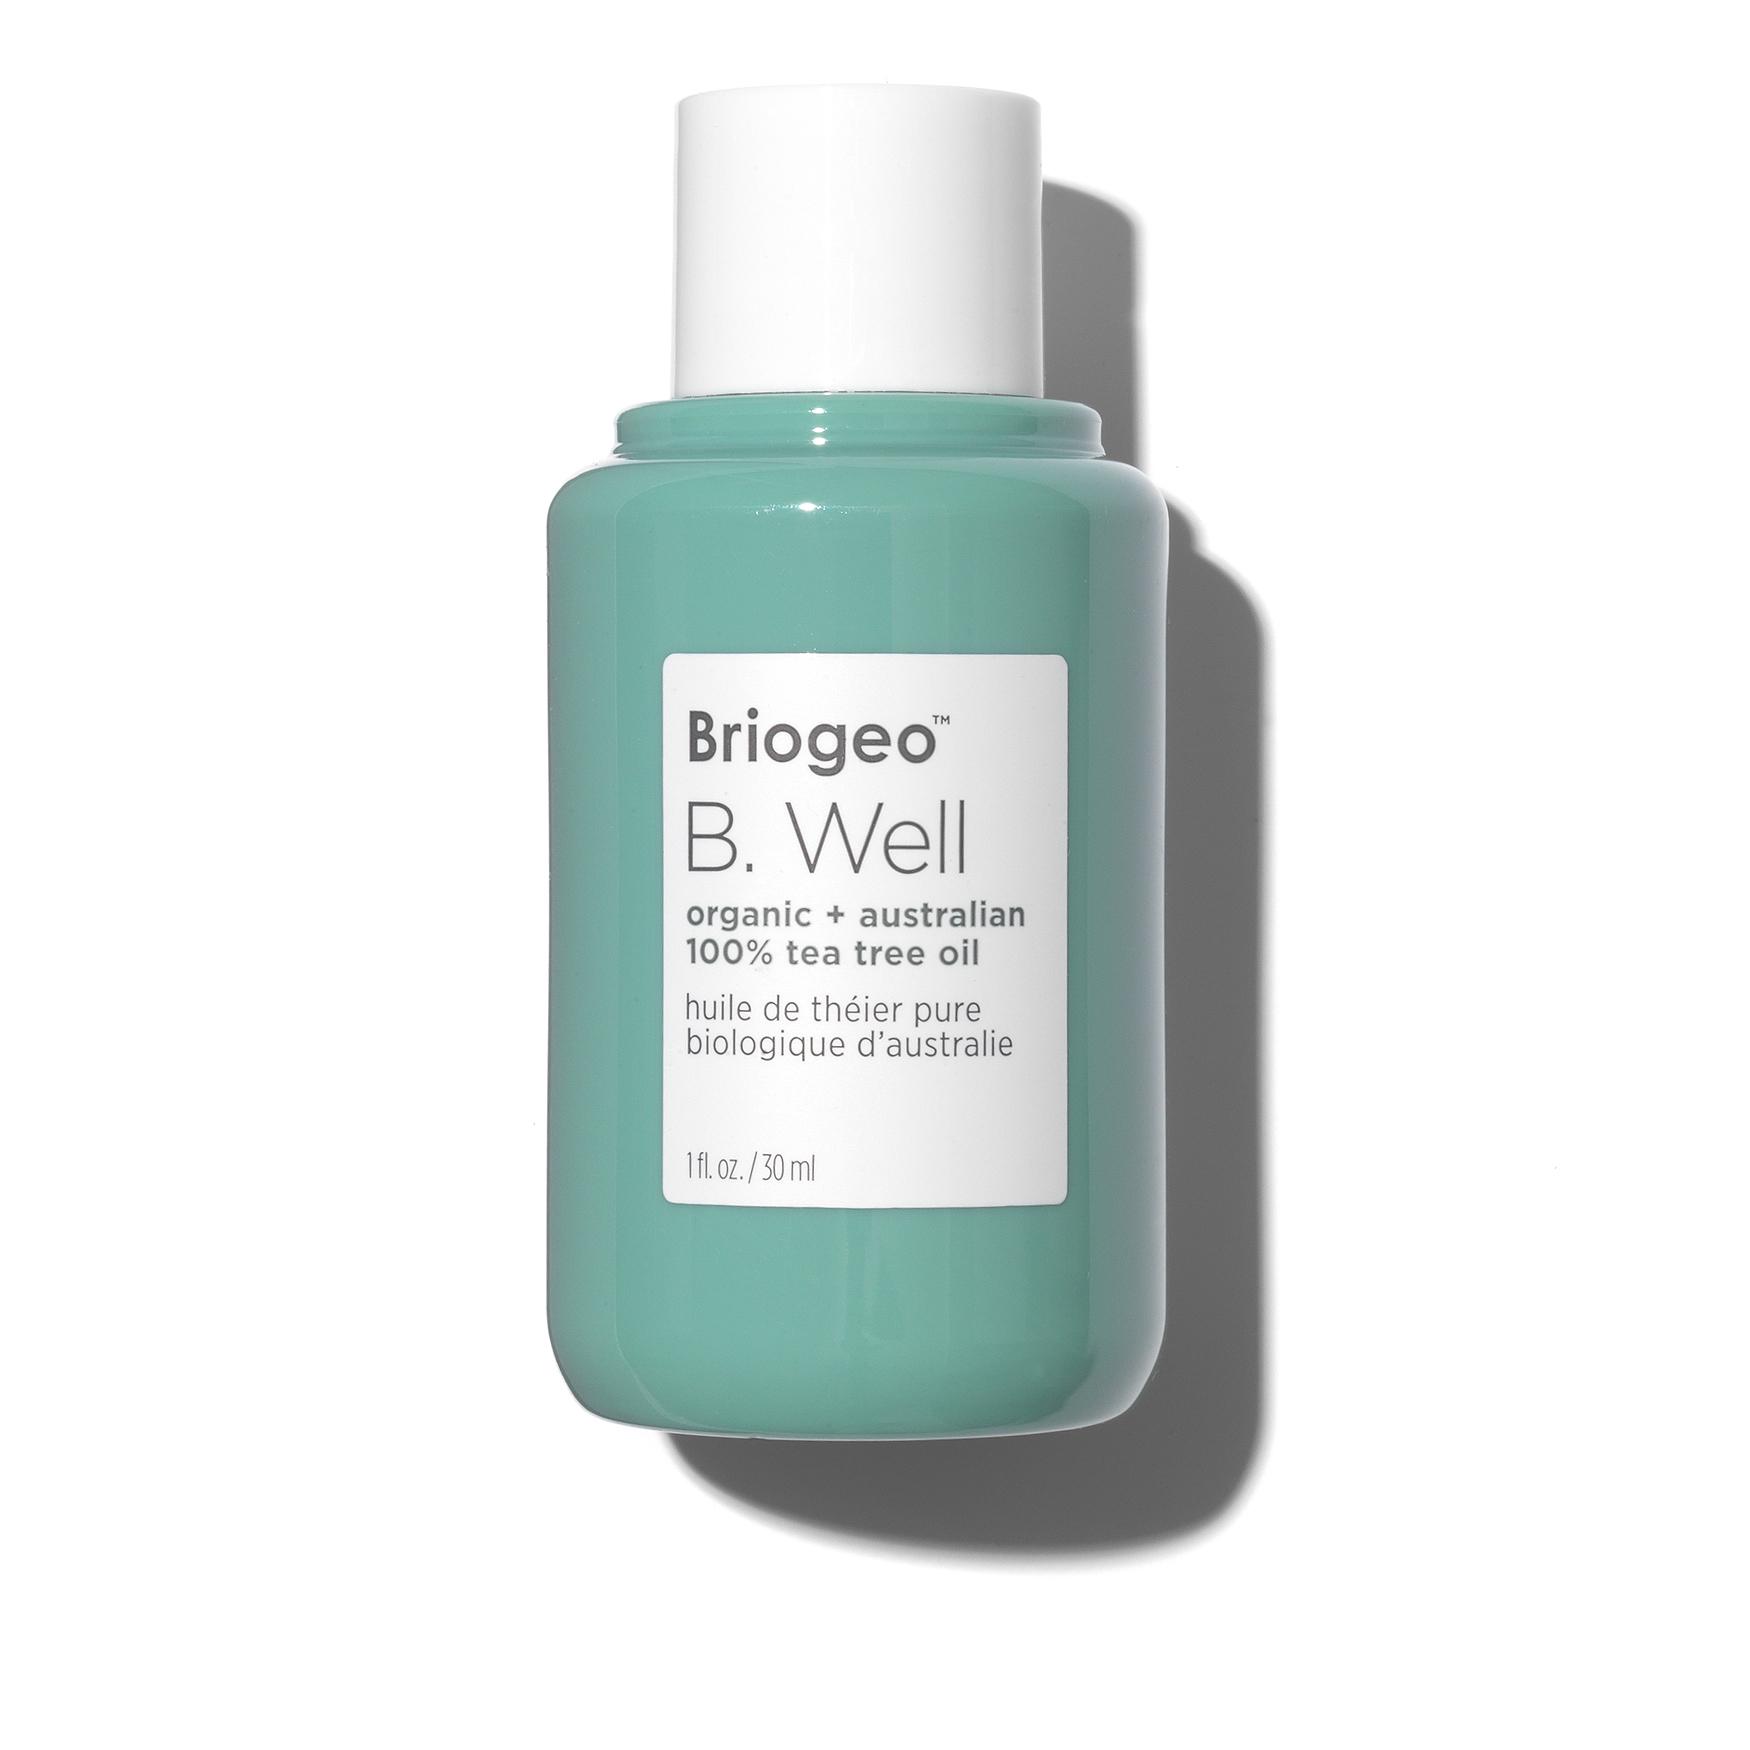 B. Well™ Organic + Australian 100% Tea Tree Oil, , large